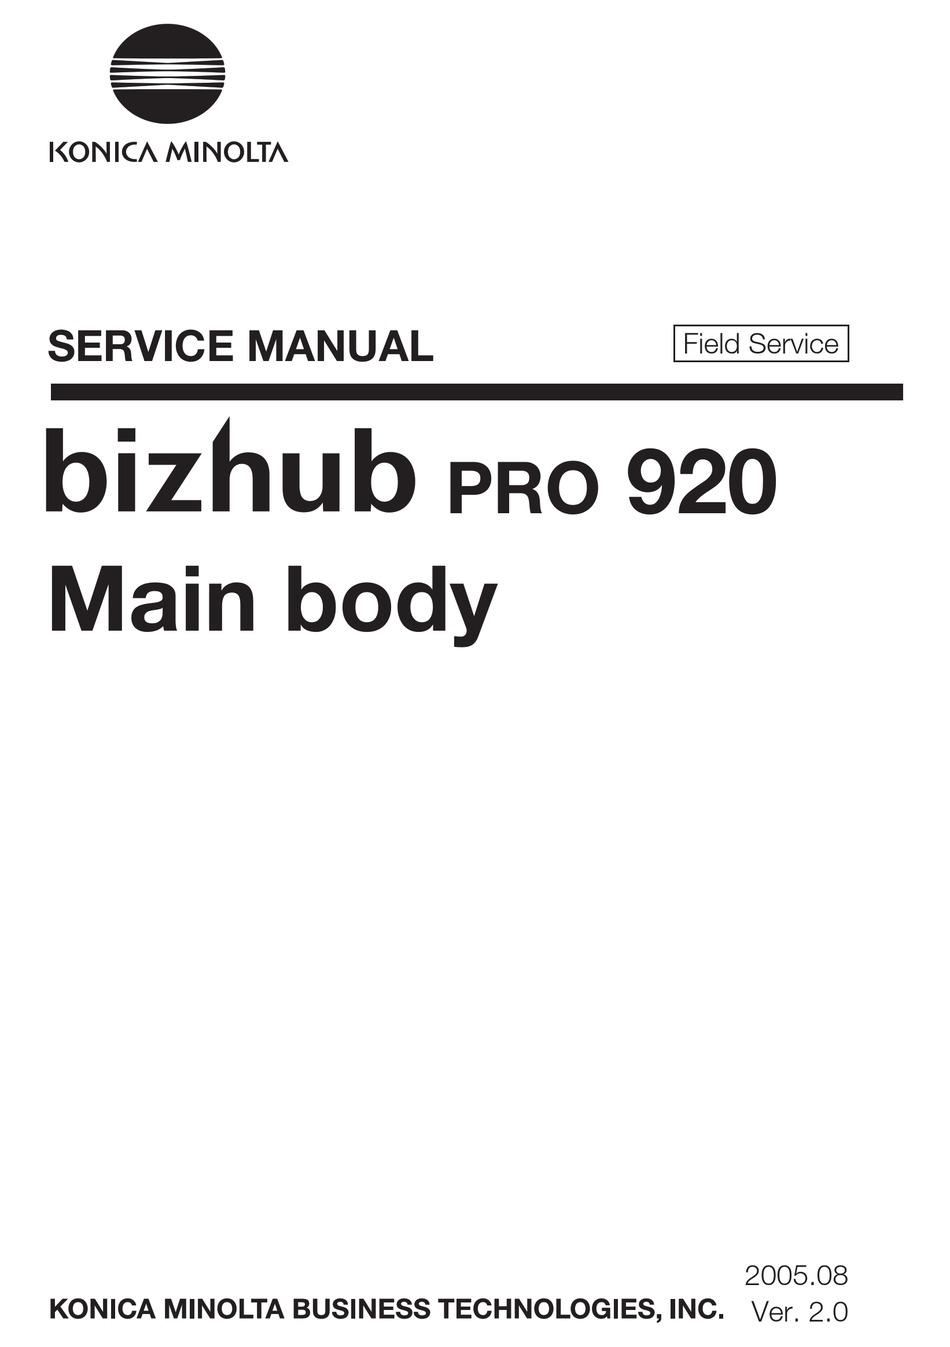 Parts Guide Manual Bizhub 920 Bizhub Pro 920